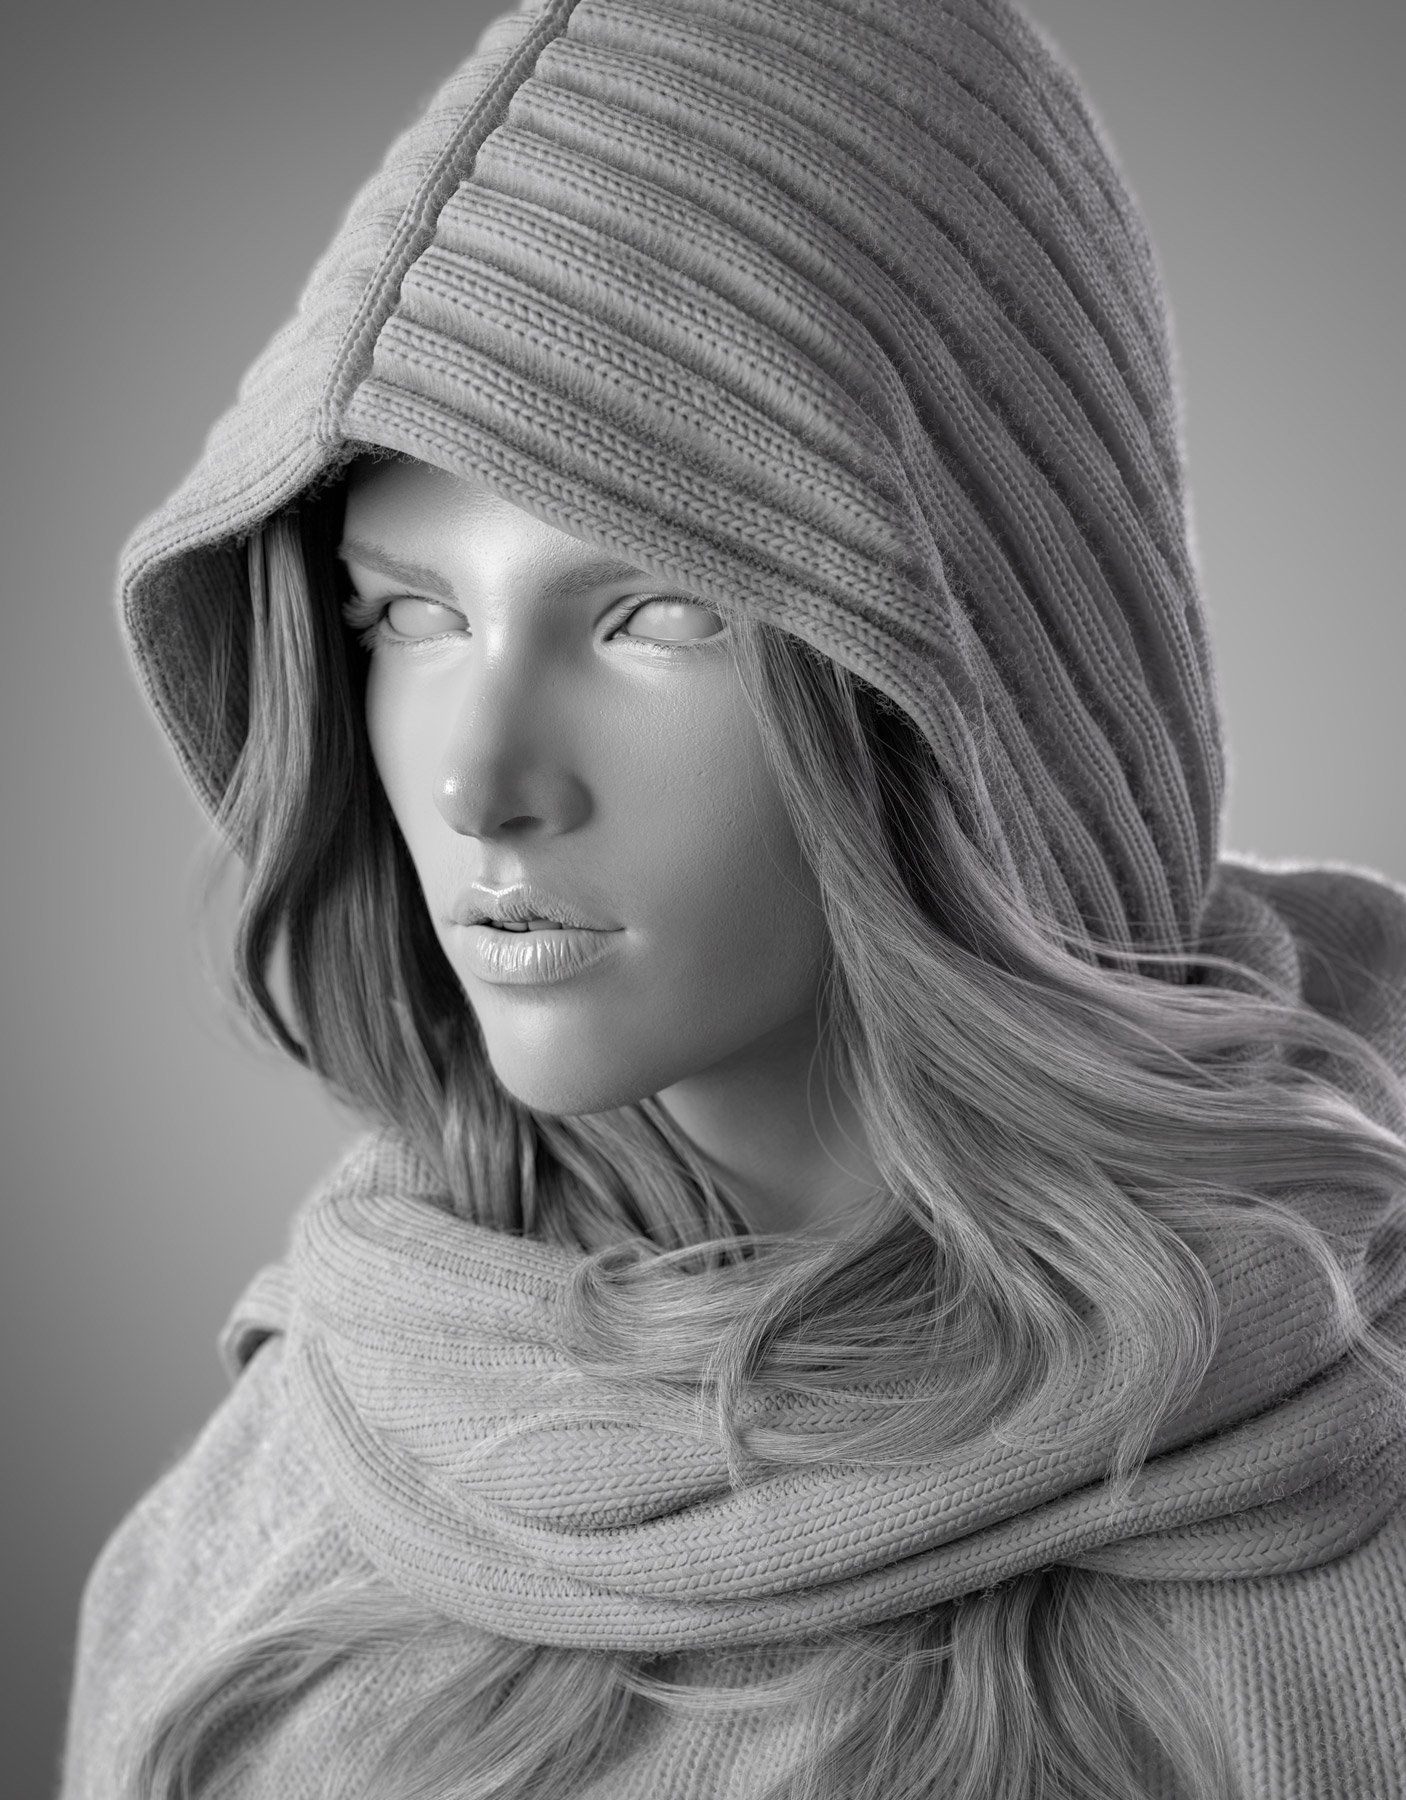 https://www.artstation.com/artwork/portrait-of-sylvia